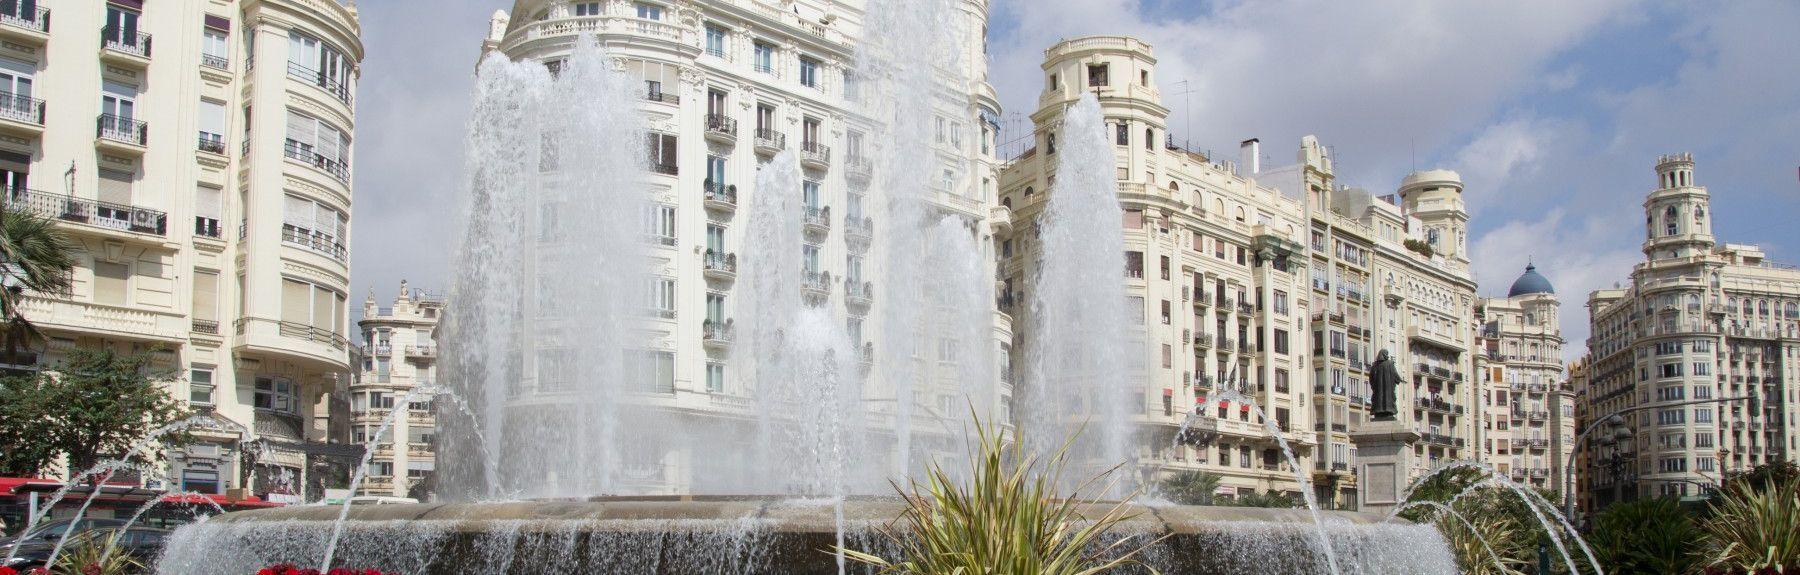 Ruzafa, Valencia, Valencia, Spanje